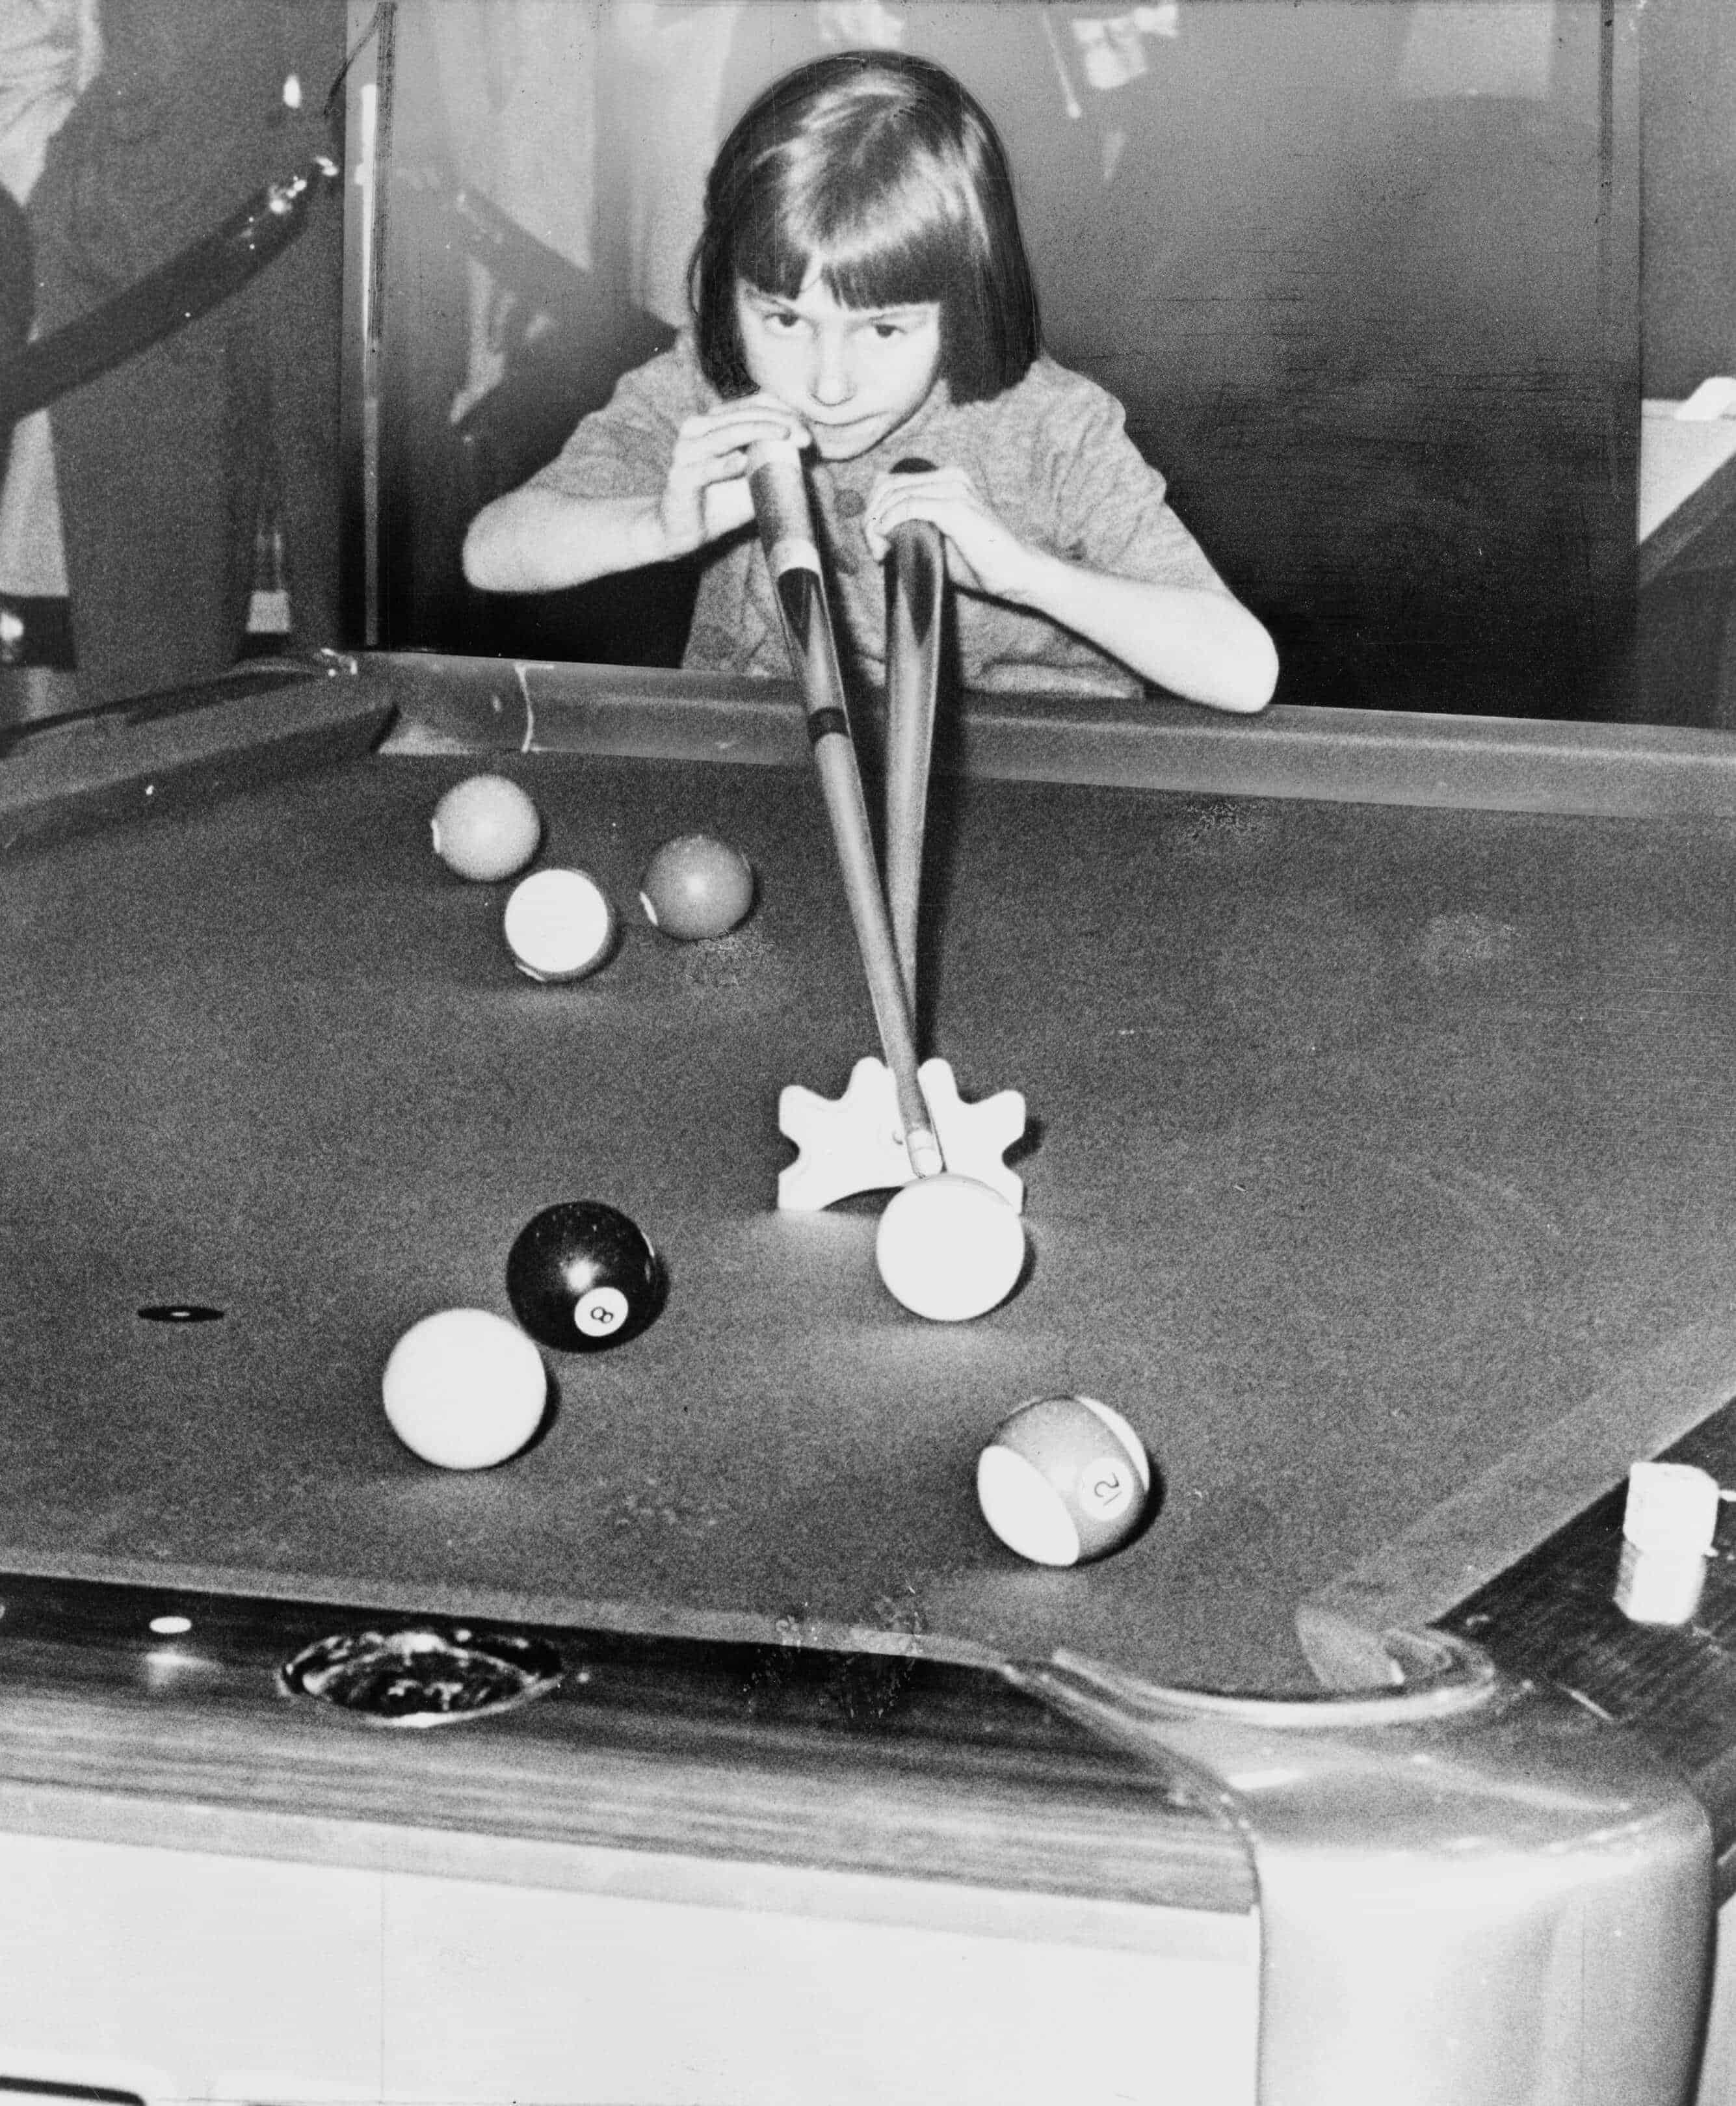 Table No Jean The Queen Balukas Bata Bar Billiards - Steve mizerak pool table